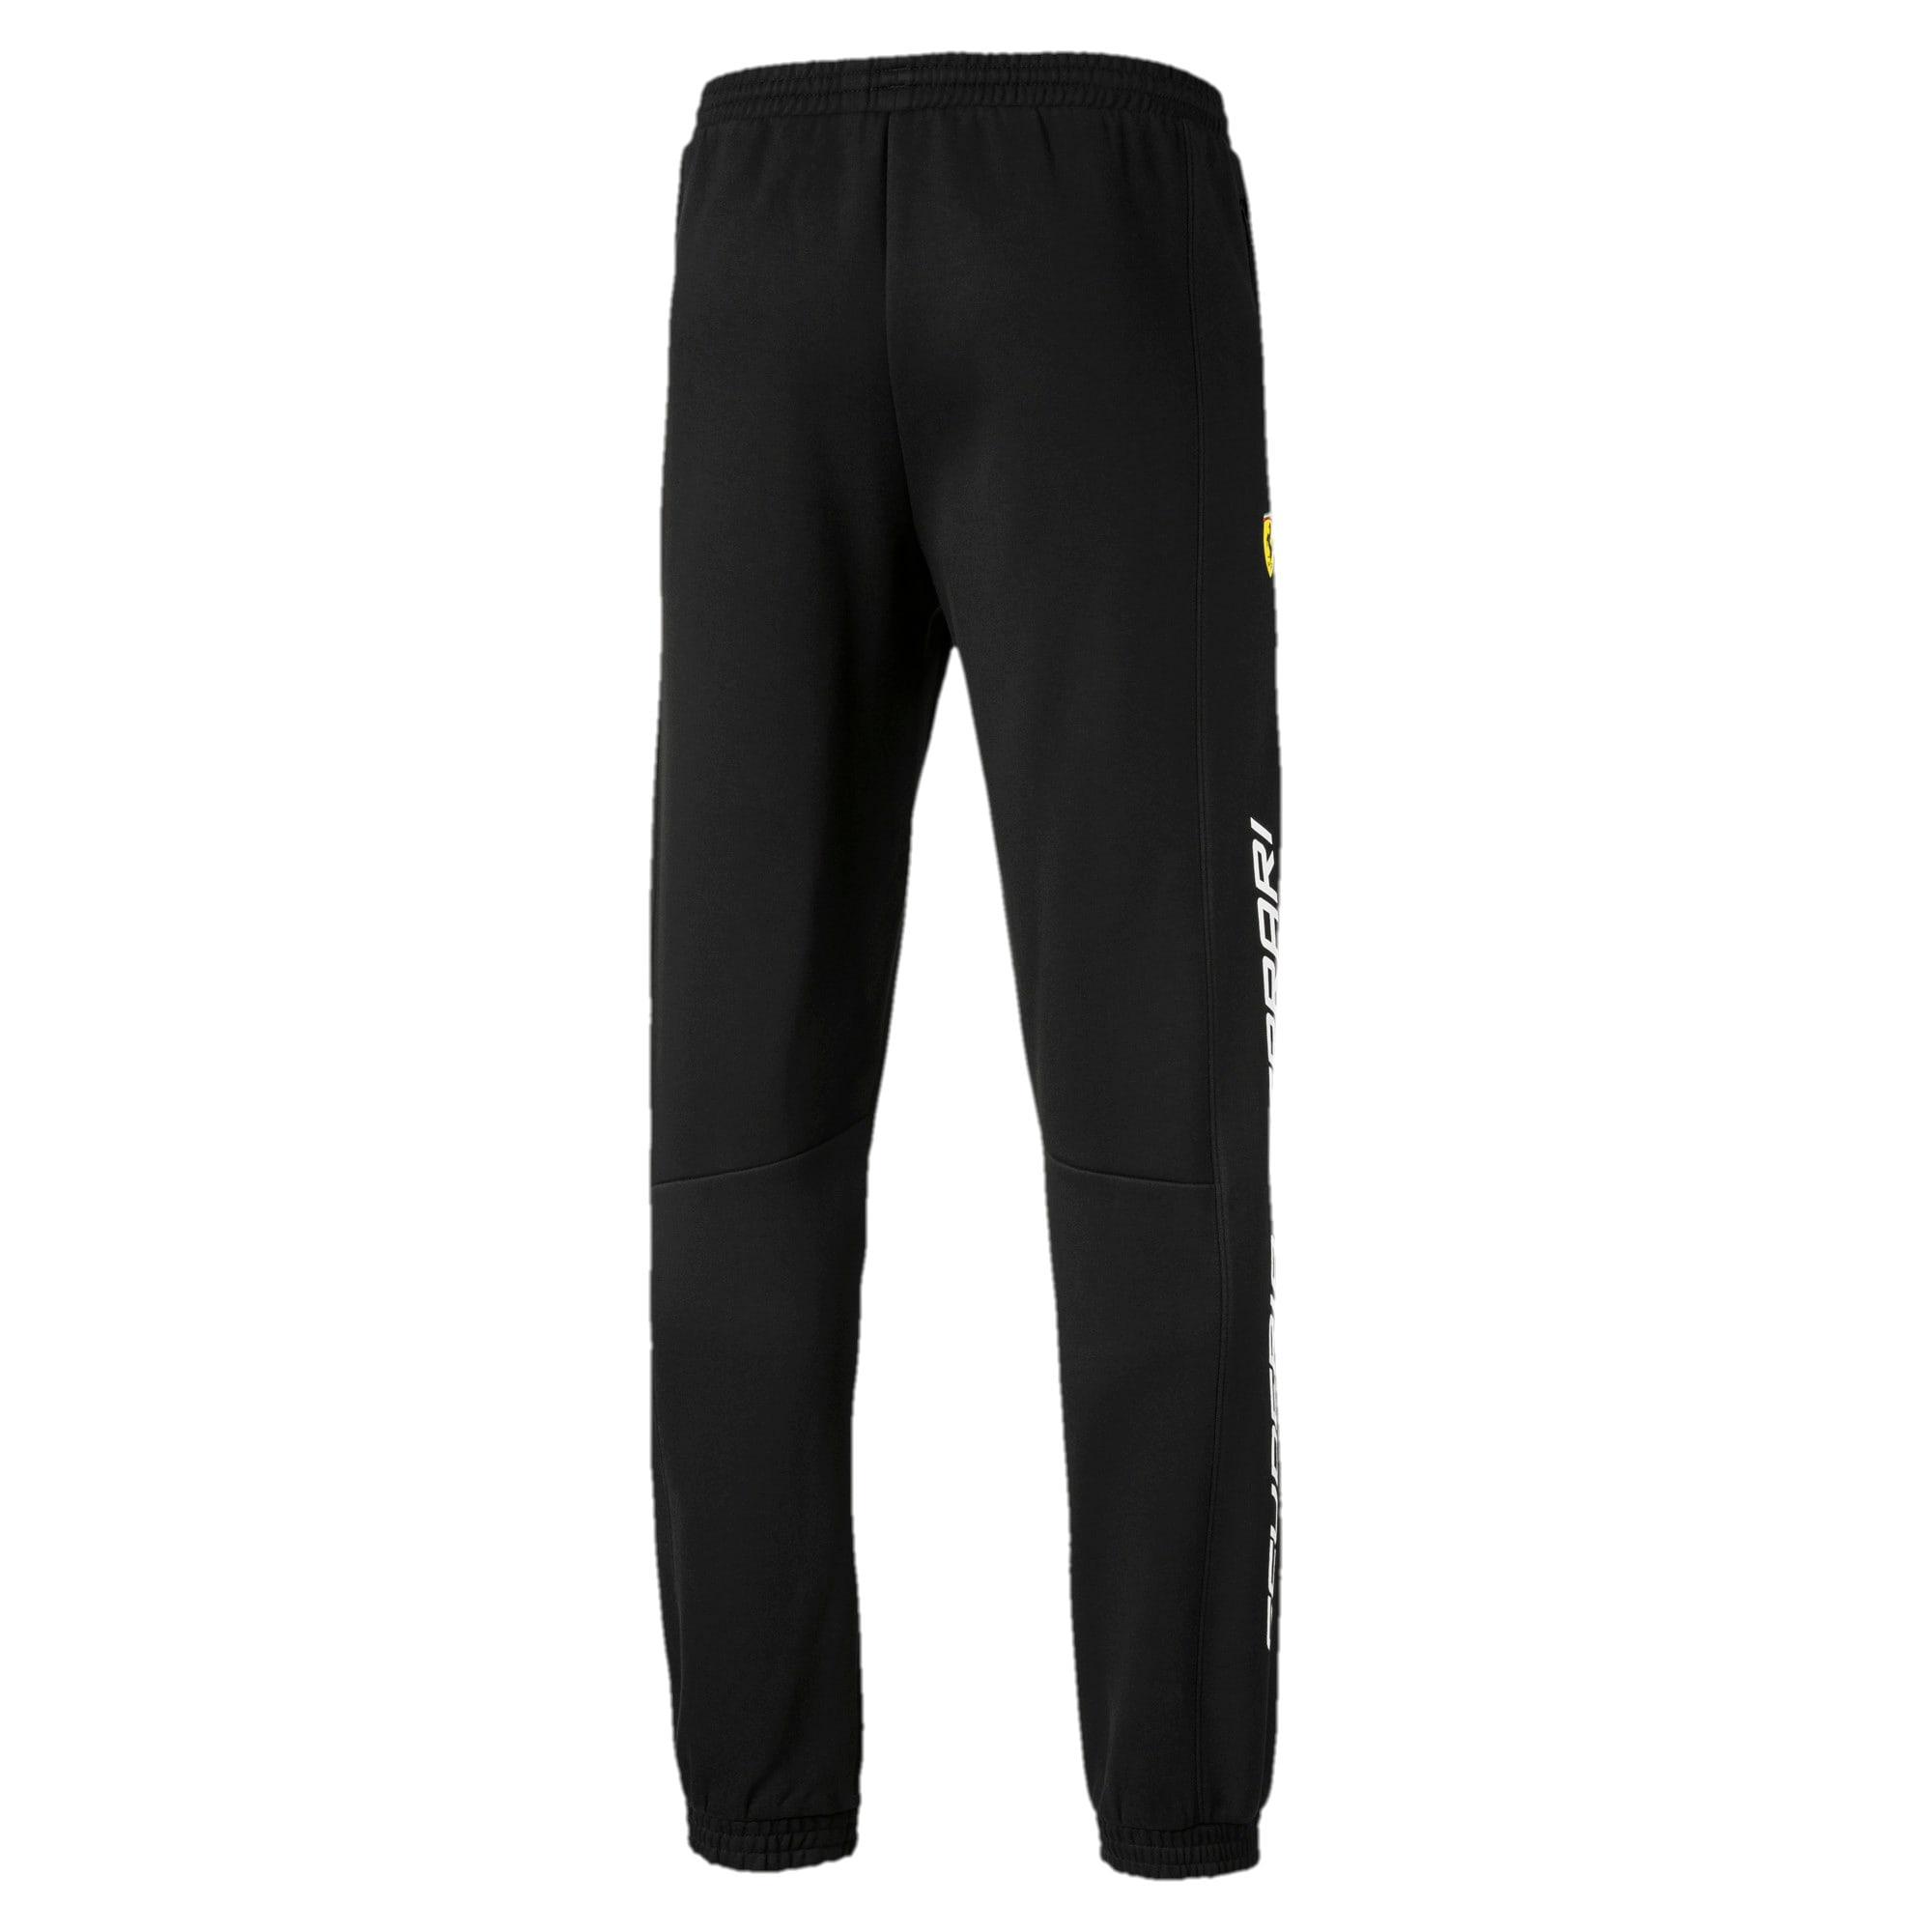 Thumbnail 5 of Ferrari Men's Sweatpants, Puma Black, medium